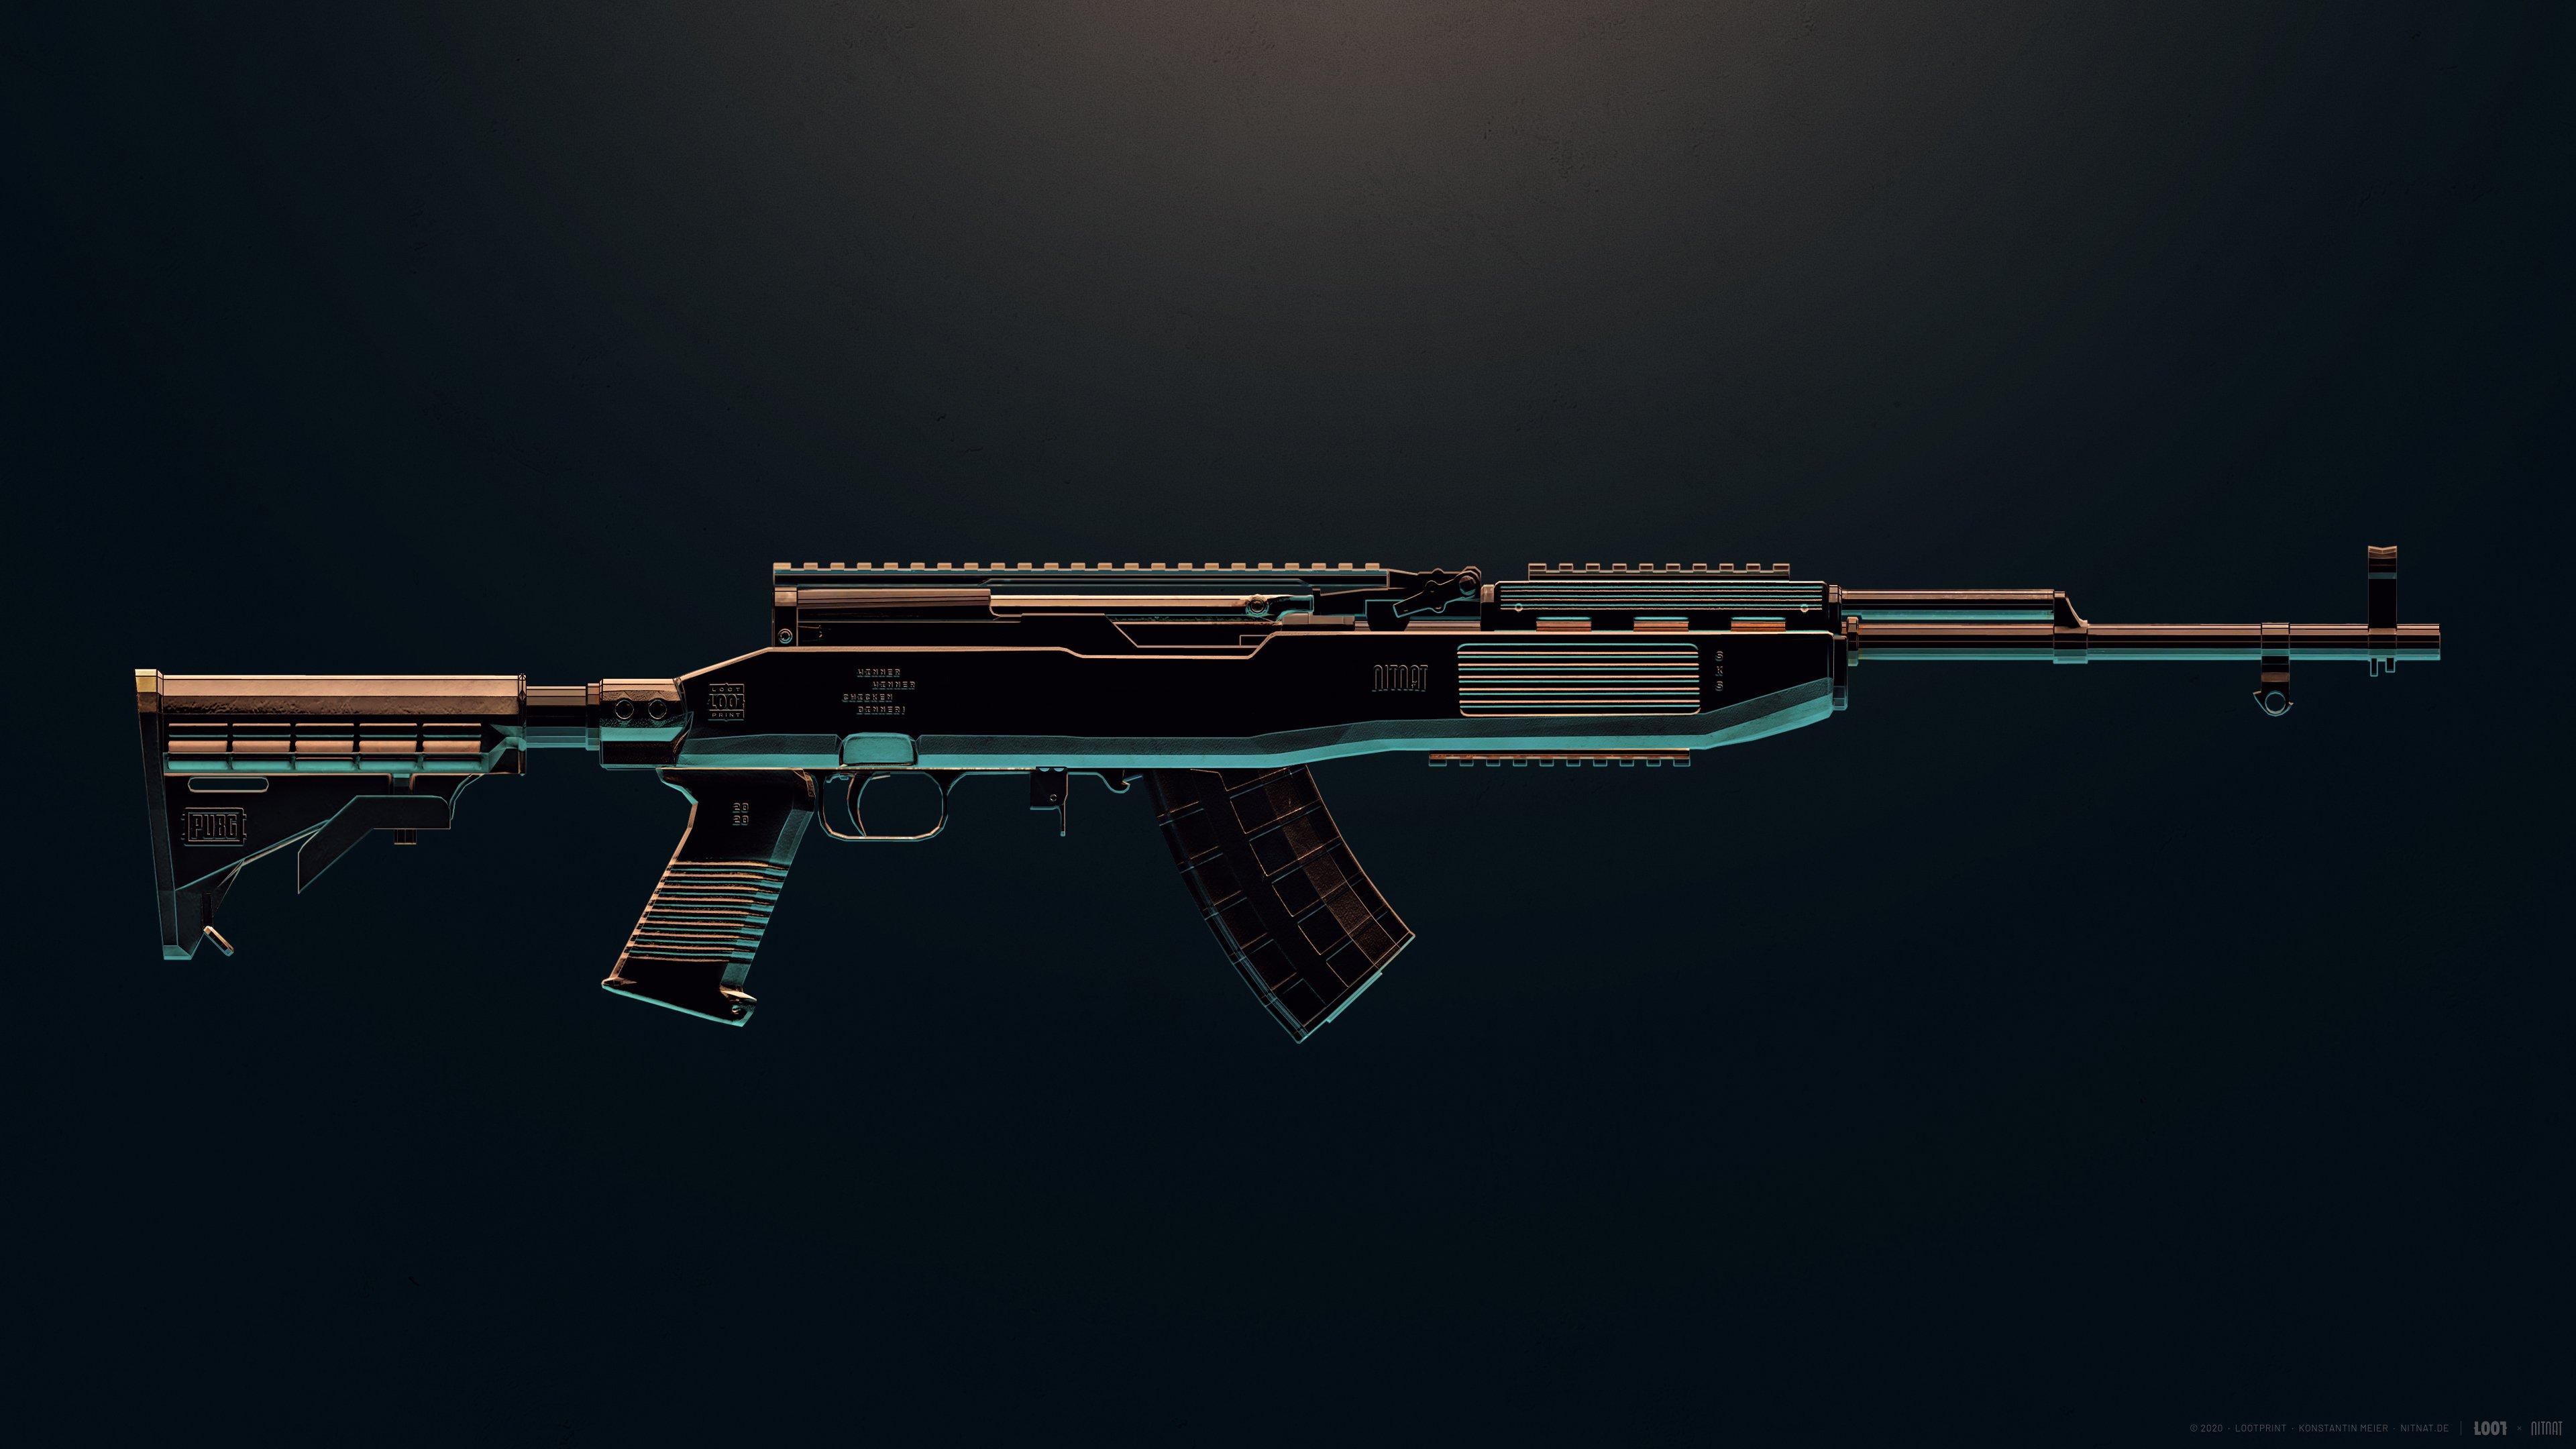 Fondos de pantalla Arma SKS de PUBG